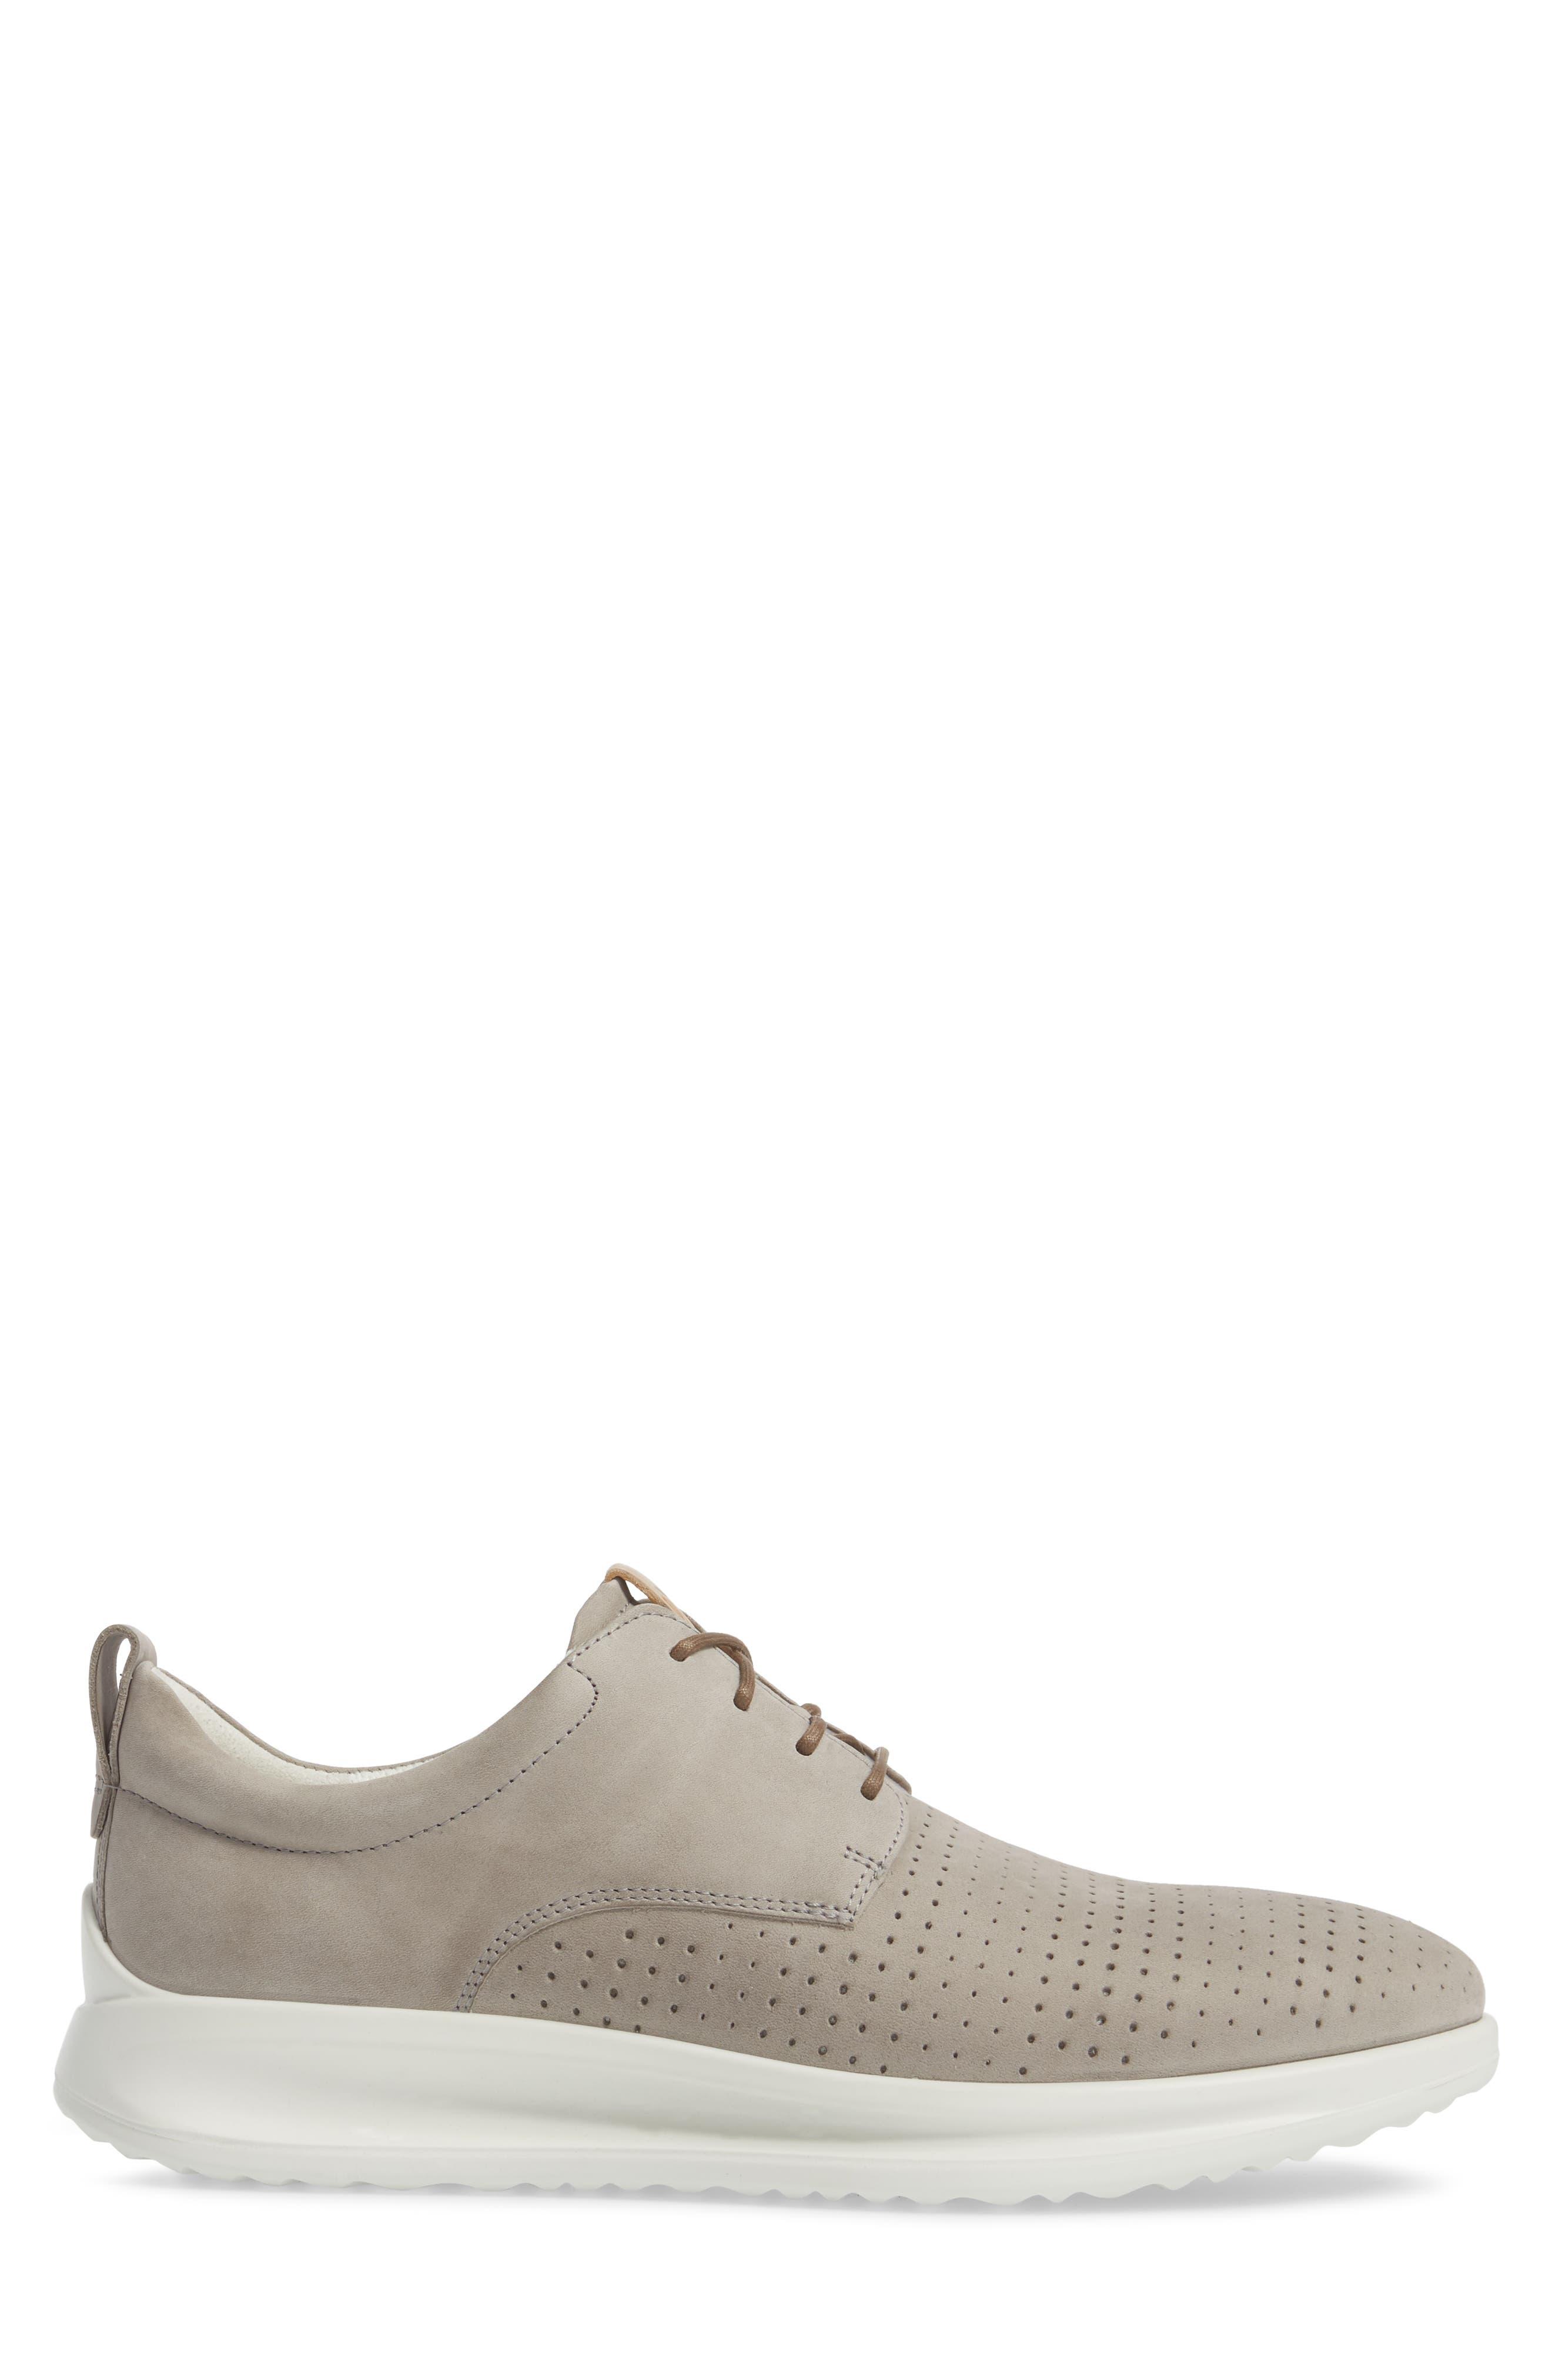 Aquet Sneaker,                             Alternate thumbnail 3, color,                             Moon Rock Leather